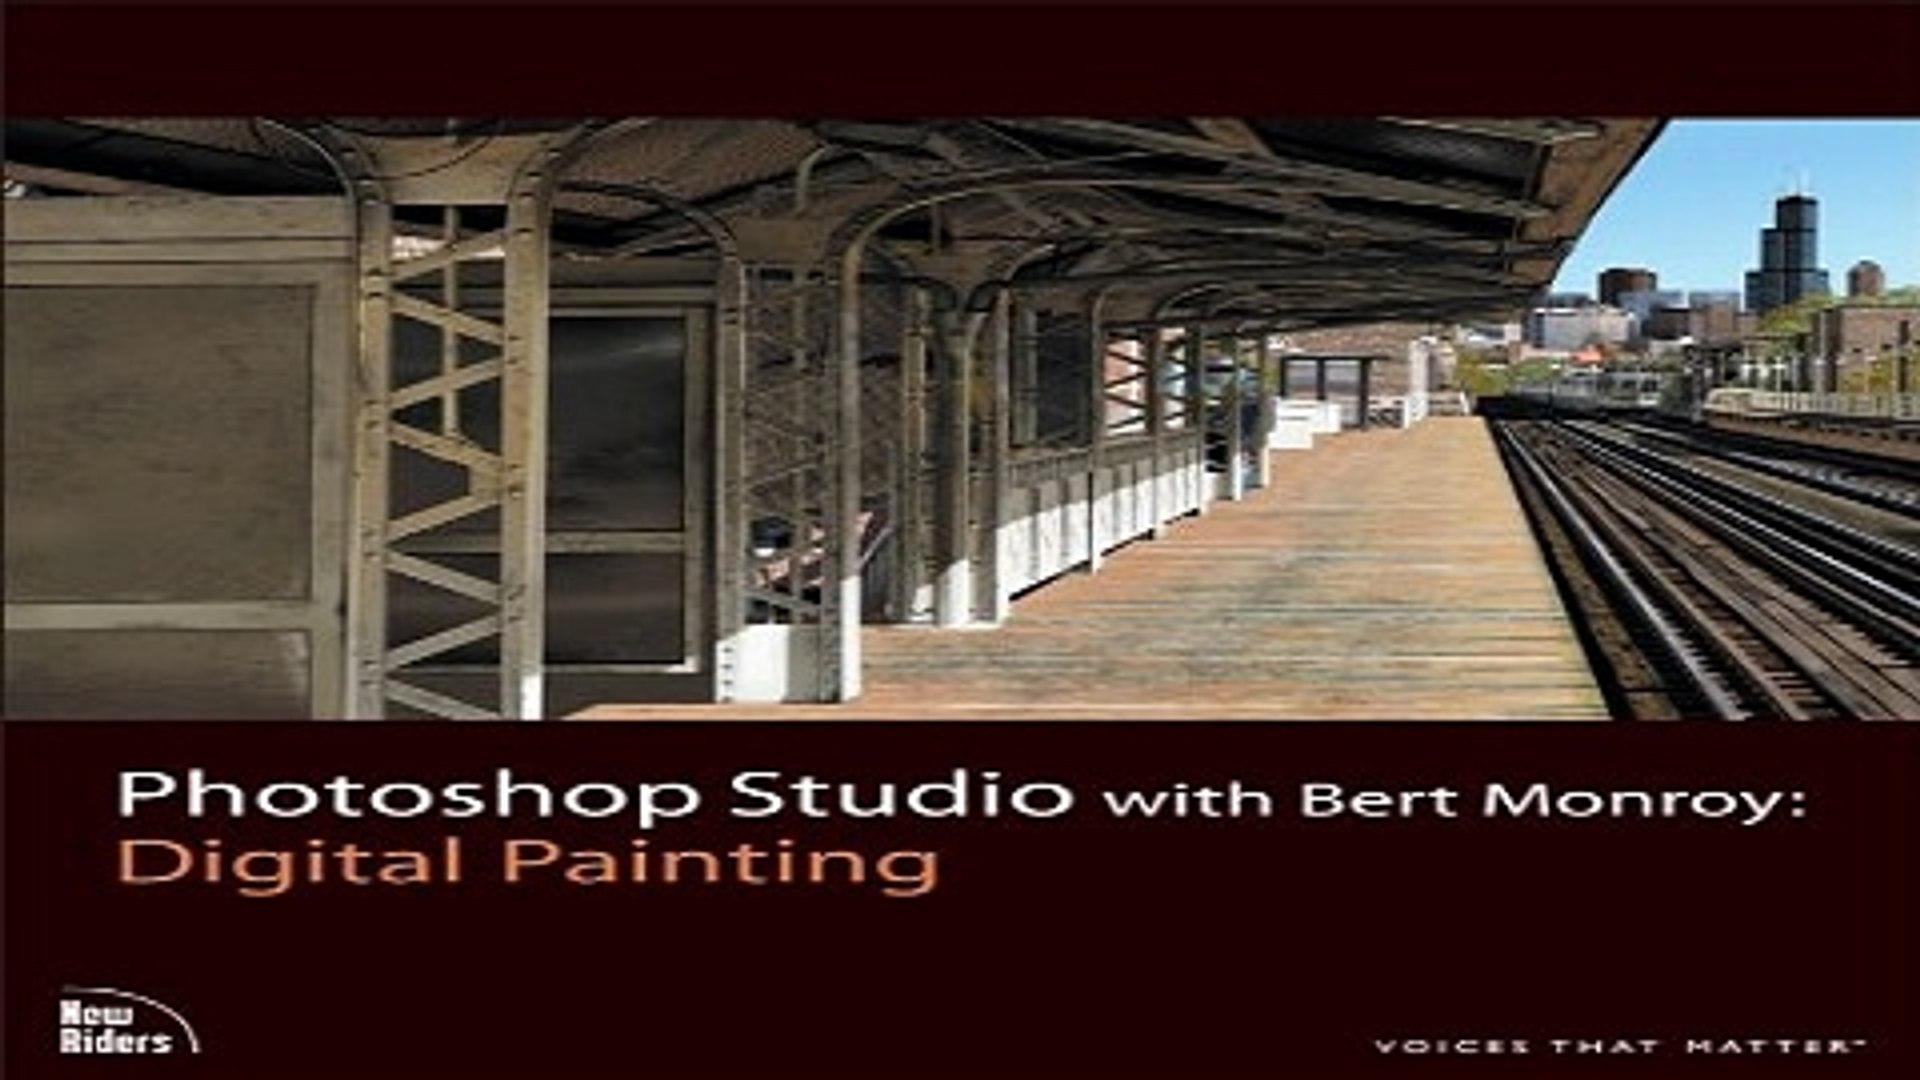 Photoshop Studio with Bert Monroy: Digital Painting